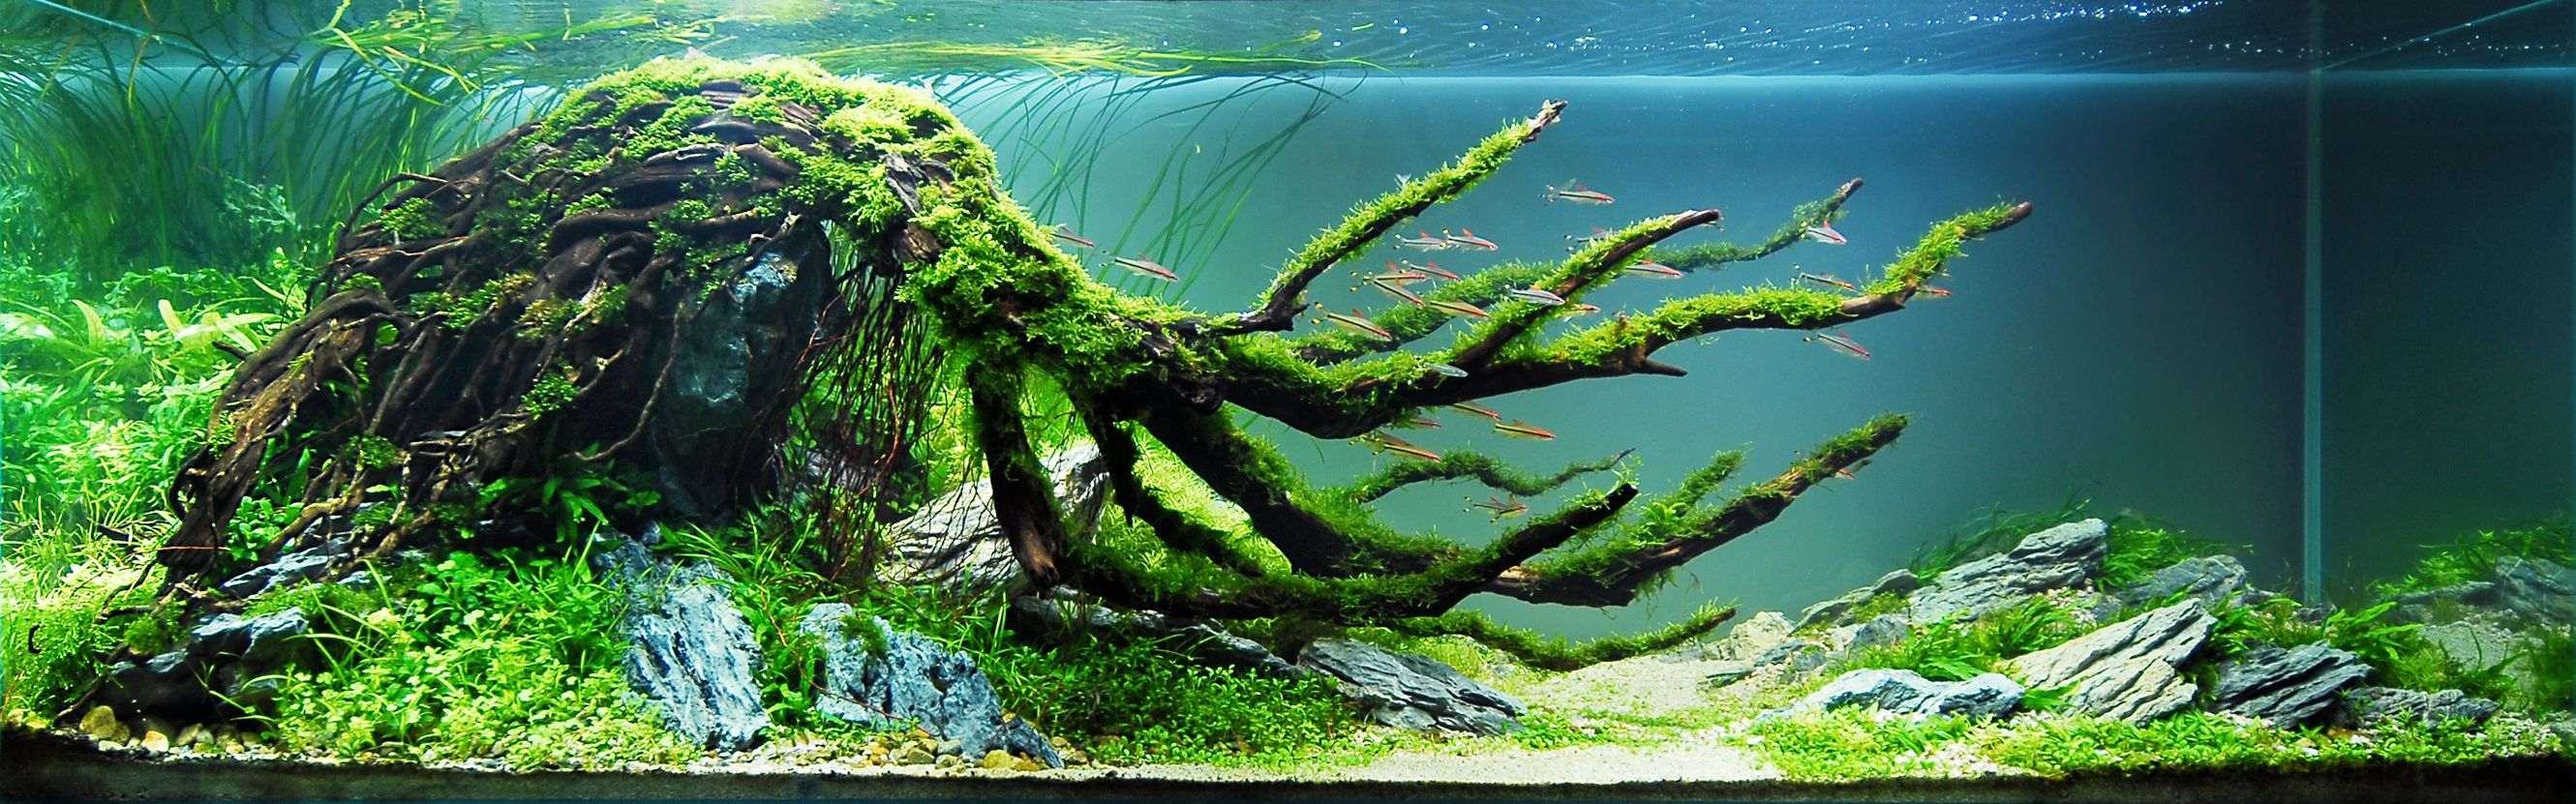 Aquascaping on Pinterest | Aquascaping, Planted Aquarium ...